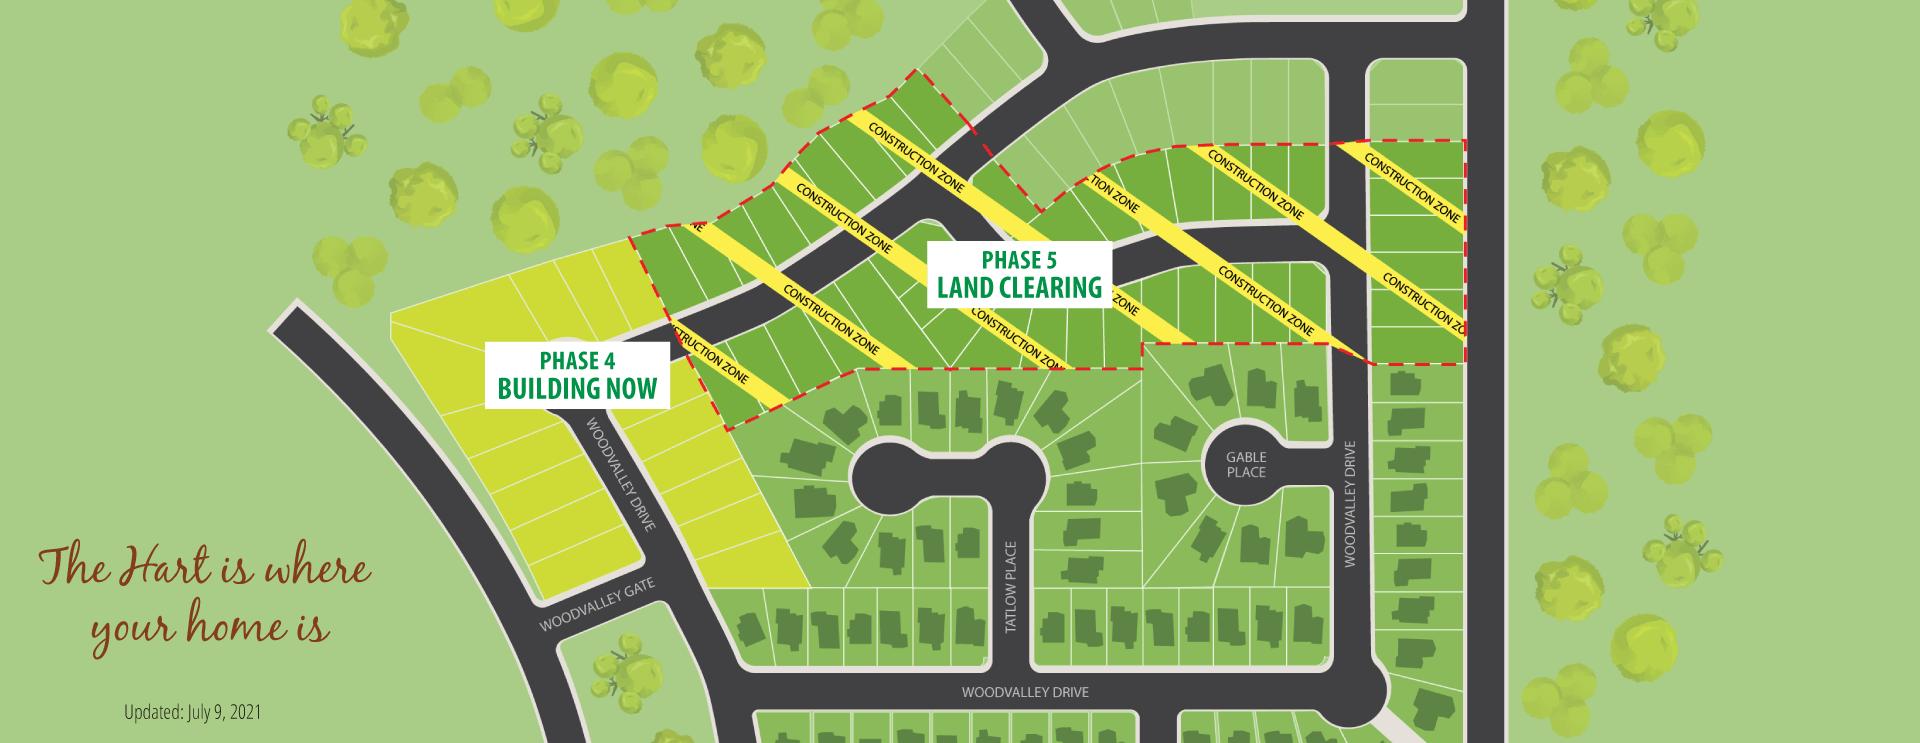 Woodlands neighborhood site map